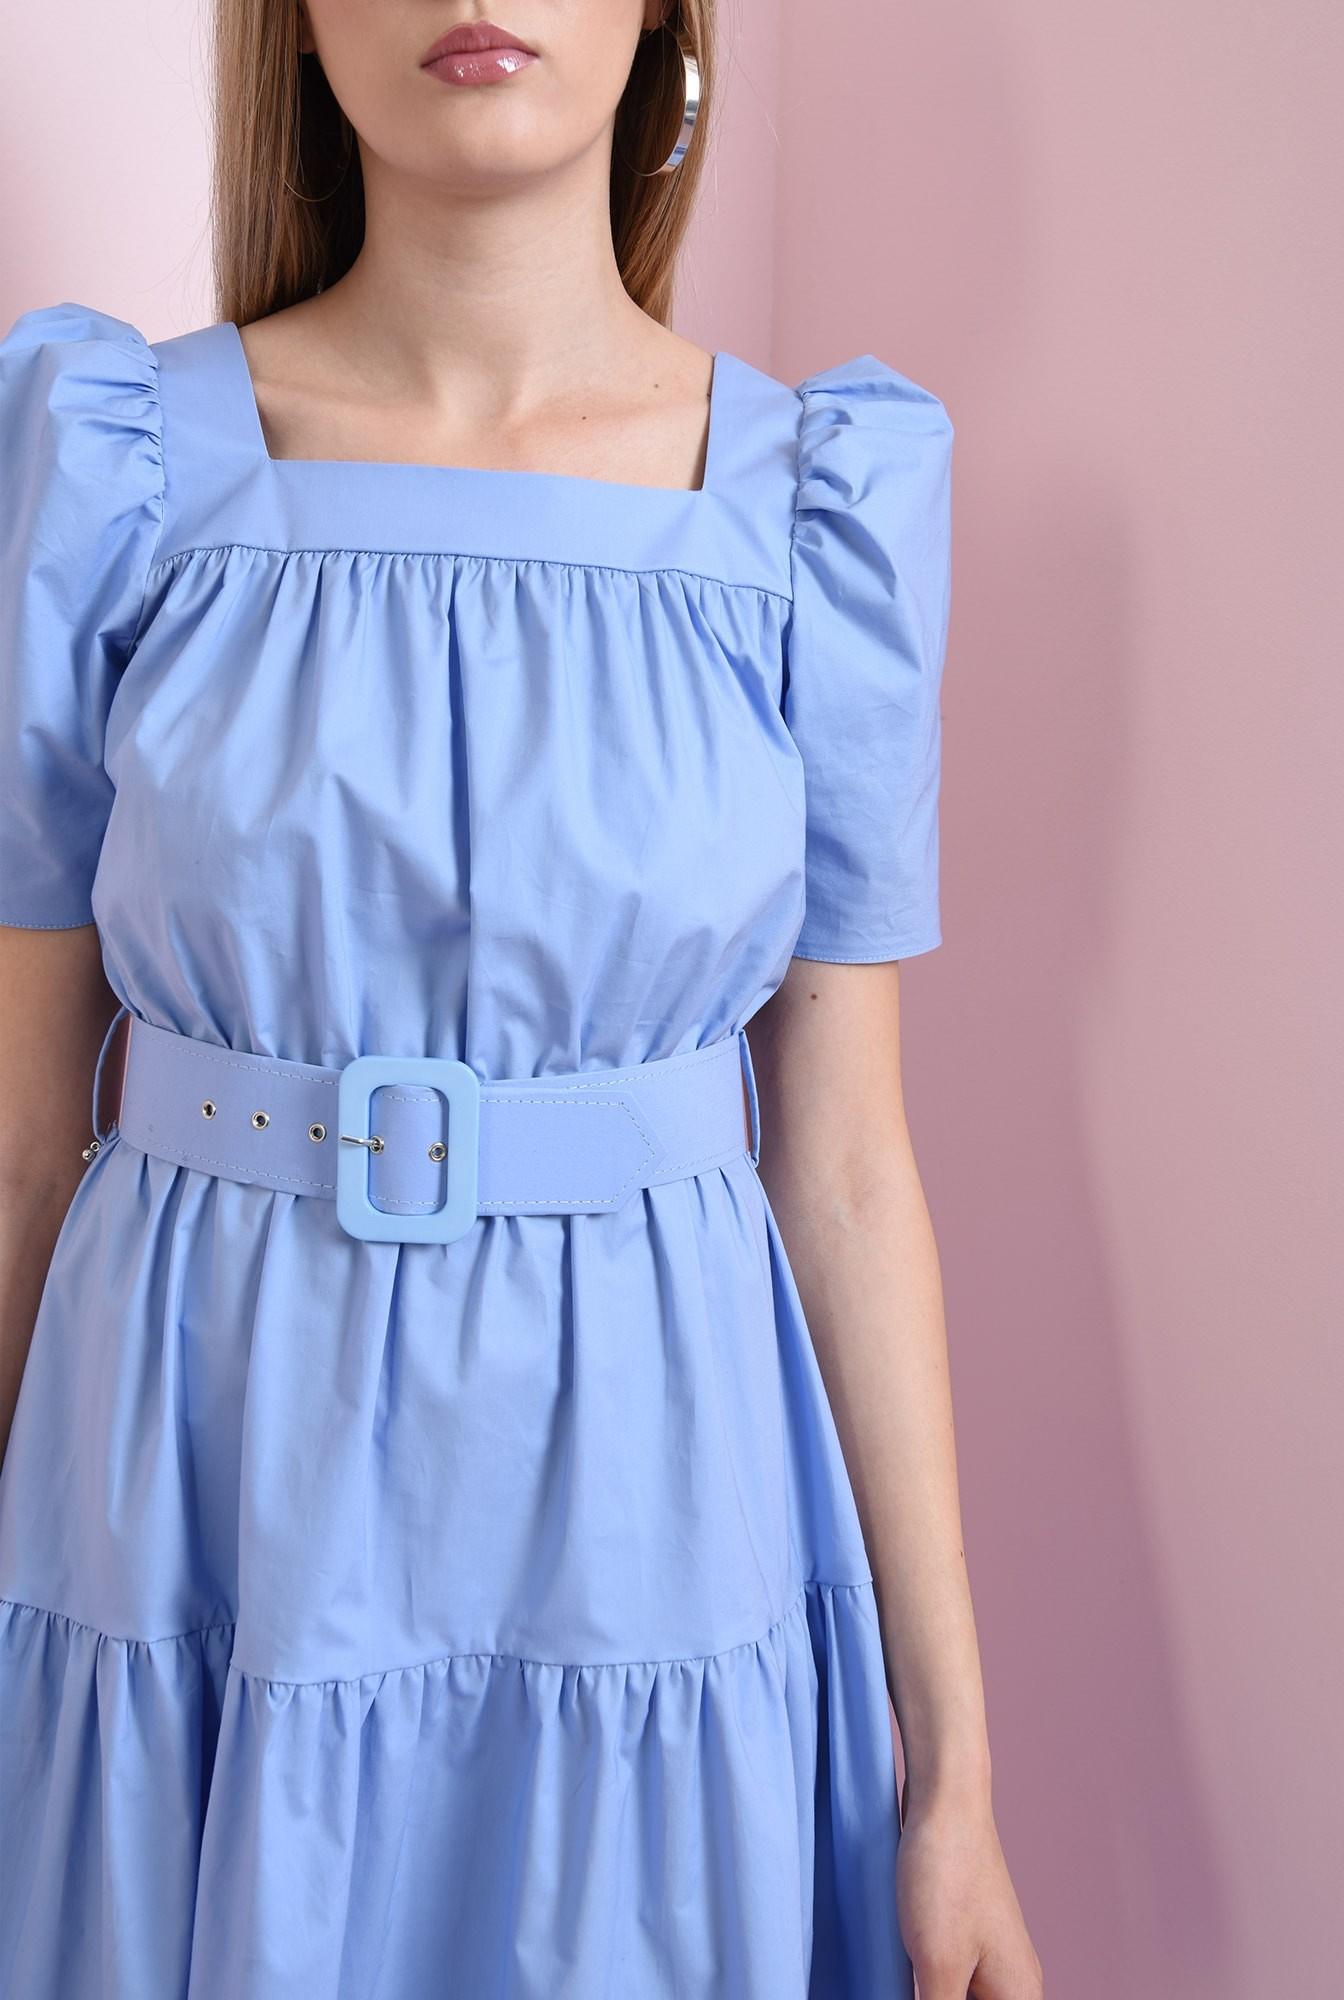 2 - rochie din bumbac, bleu, Poema